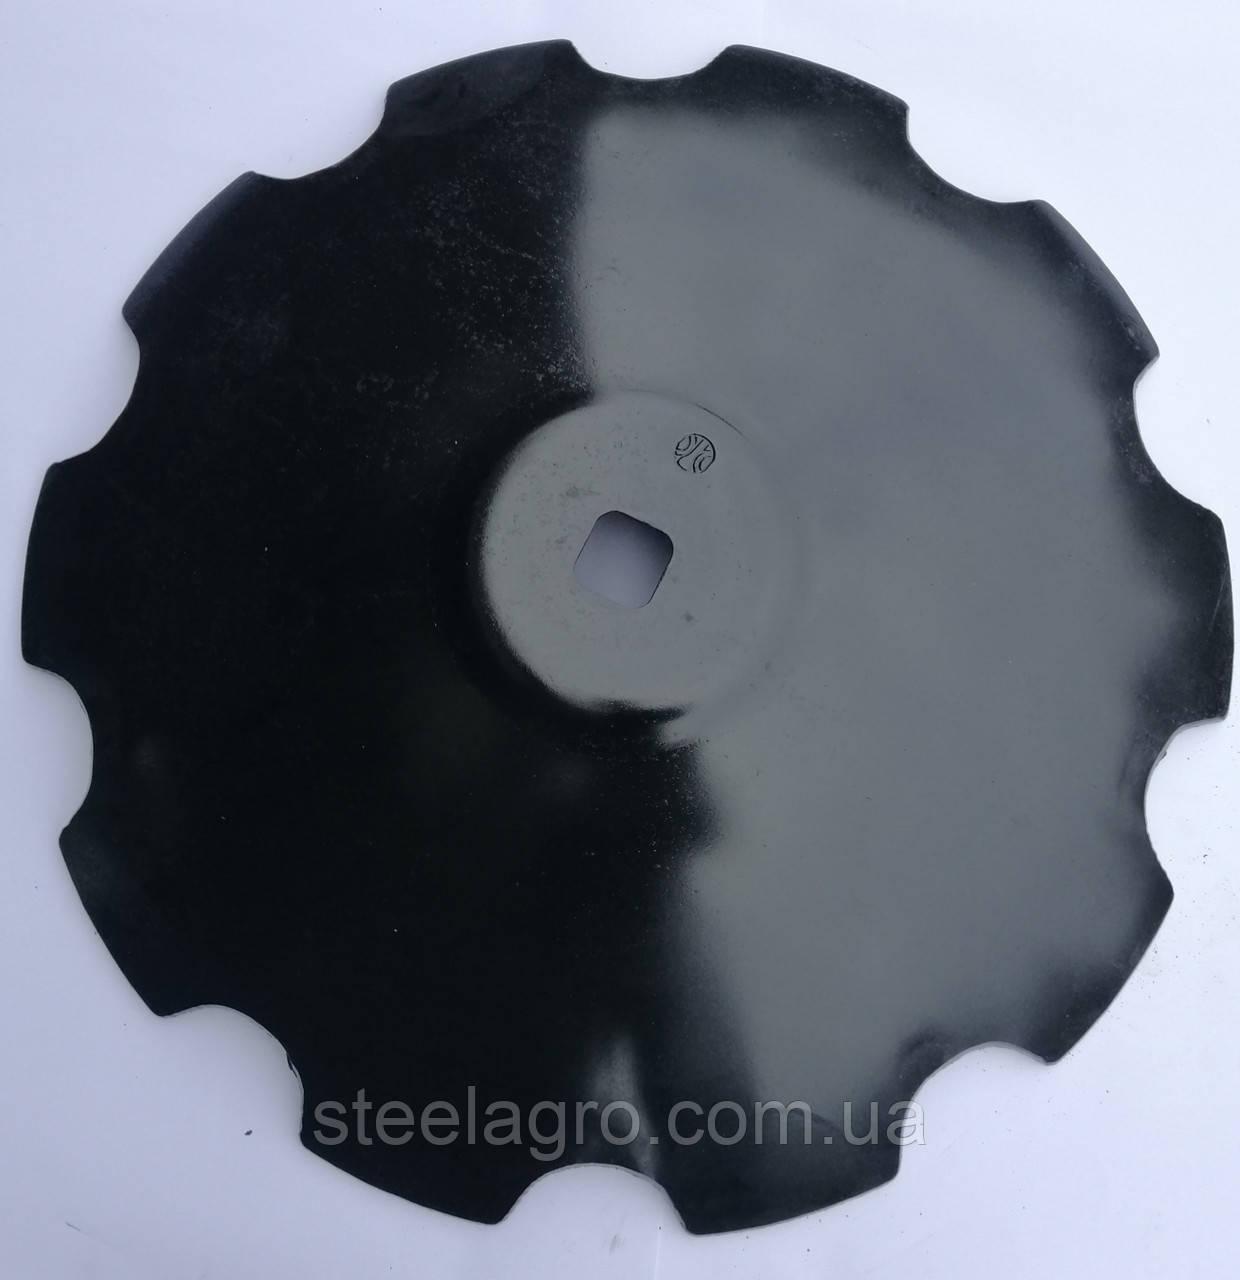 Диск ромашка/гладкий D=660 мм,кв 41,h=7мм (к боронам Kuhn, Kuhne арт. 437808,437809, 437809SM )